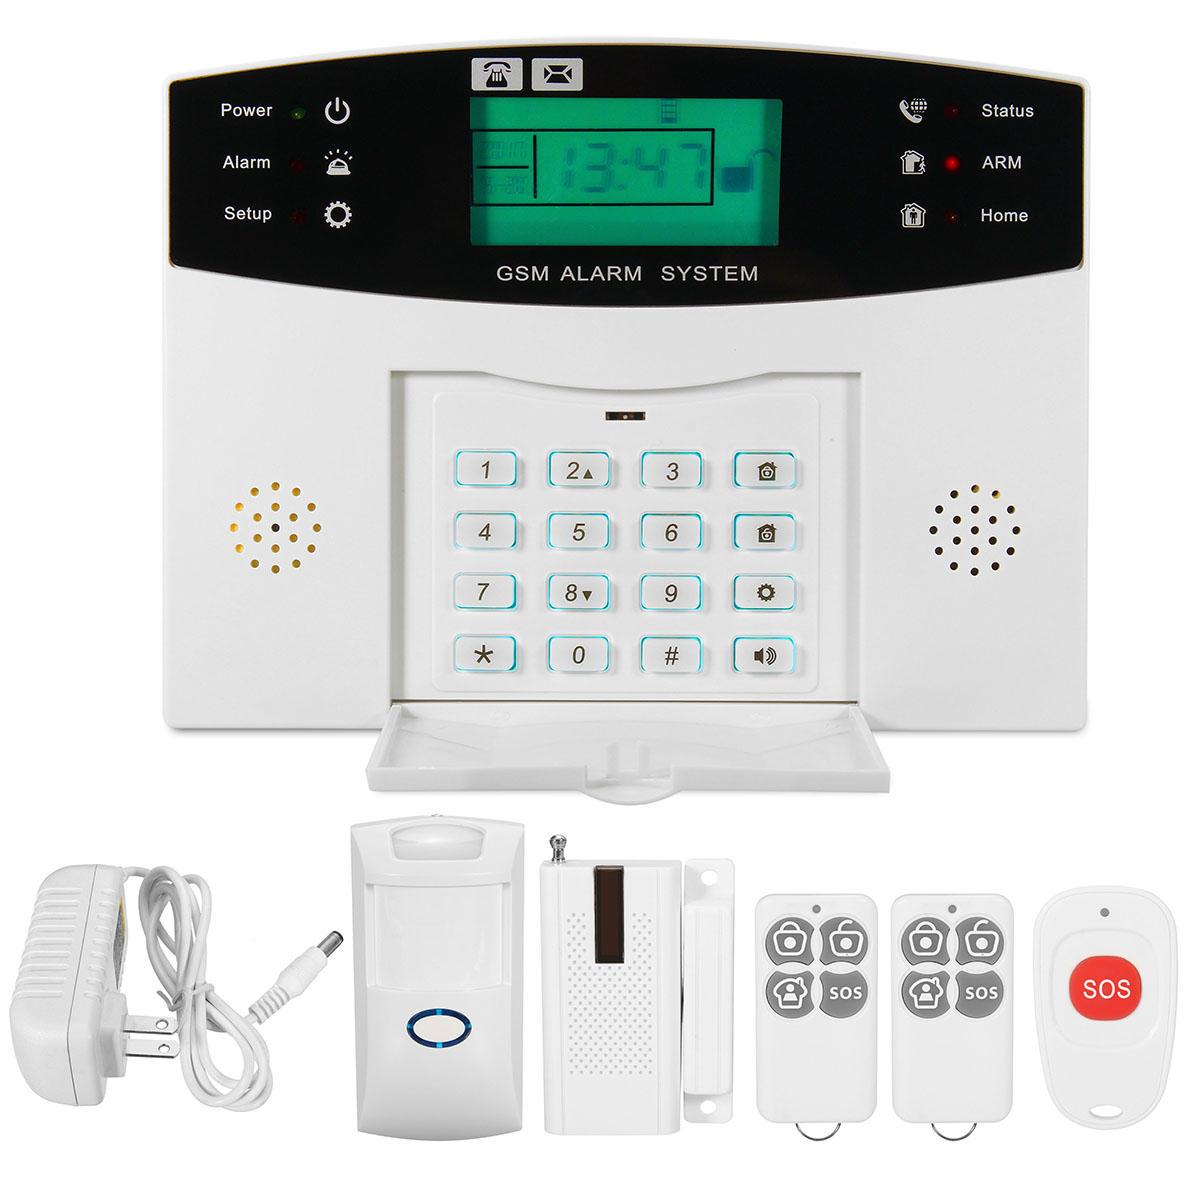 Top 5 Wireless Alarm System